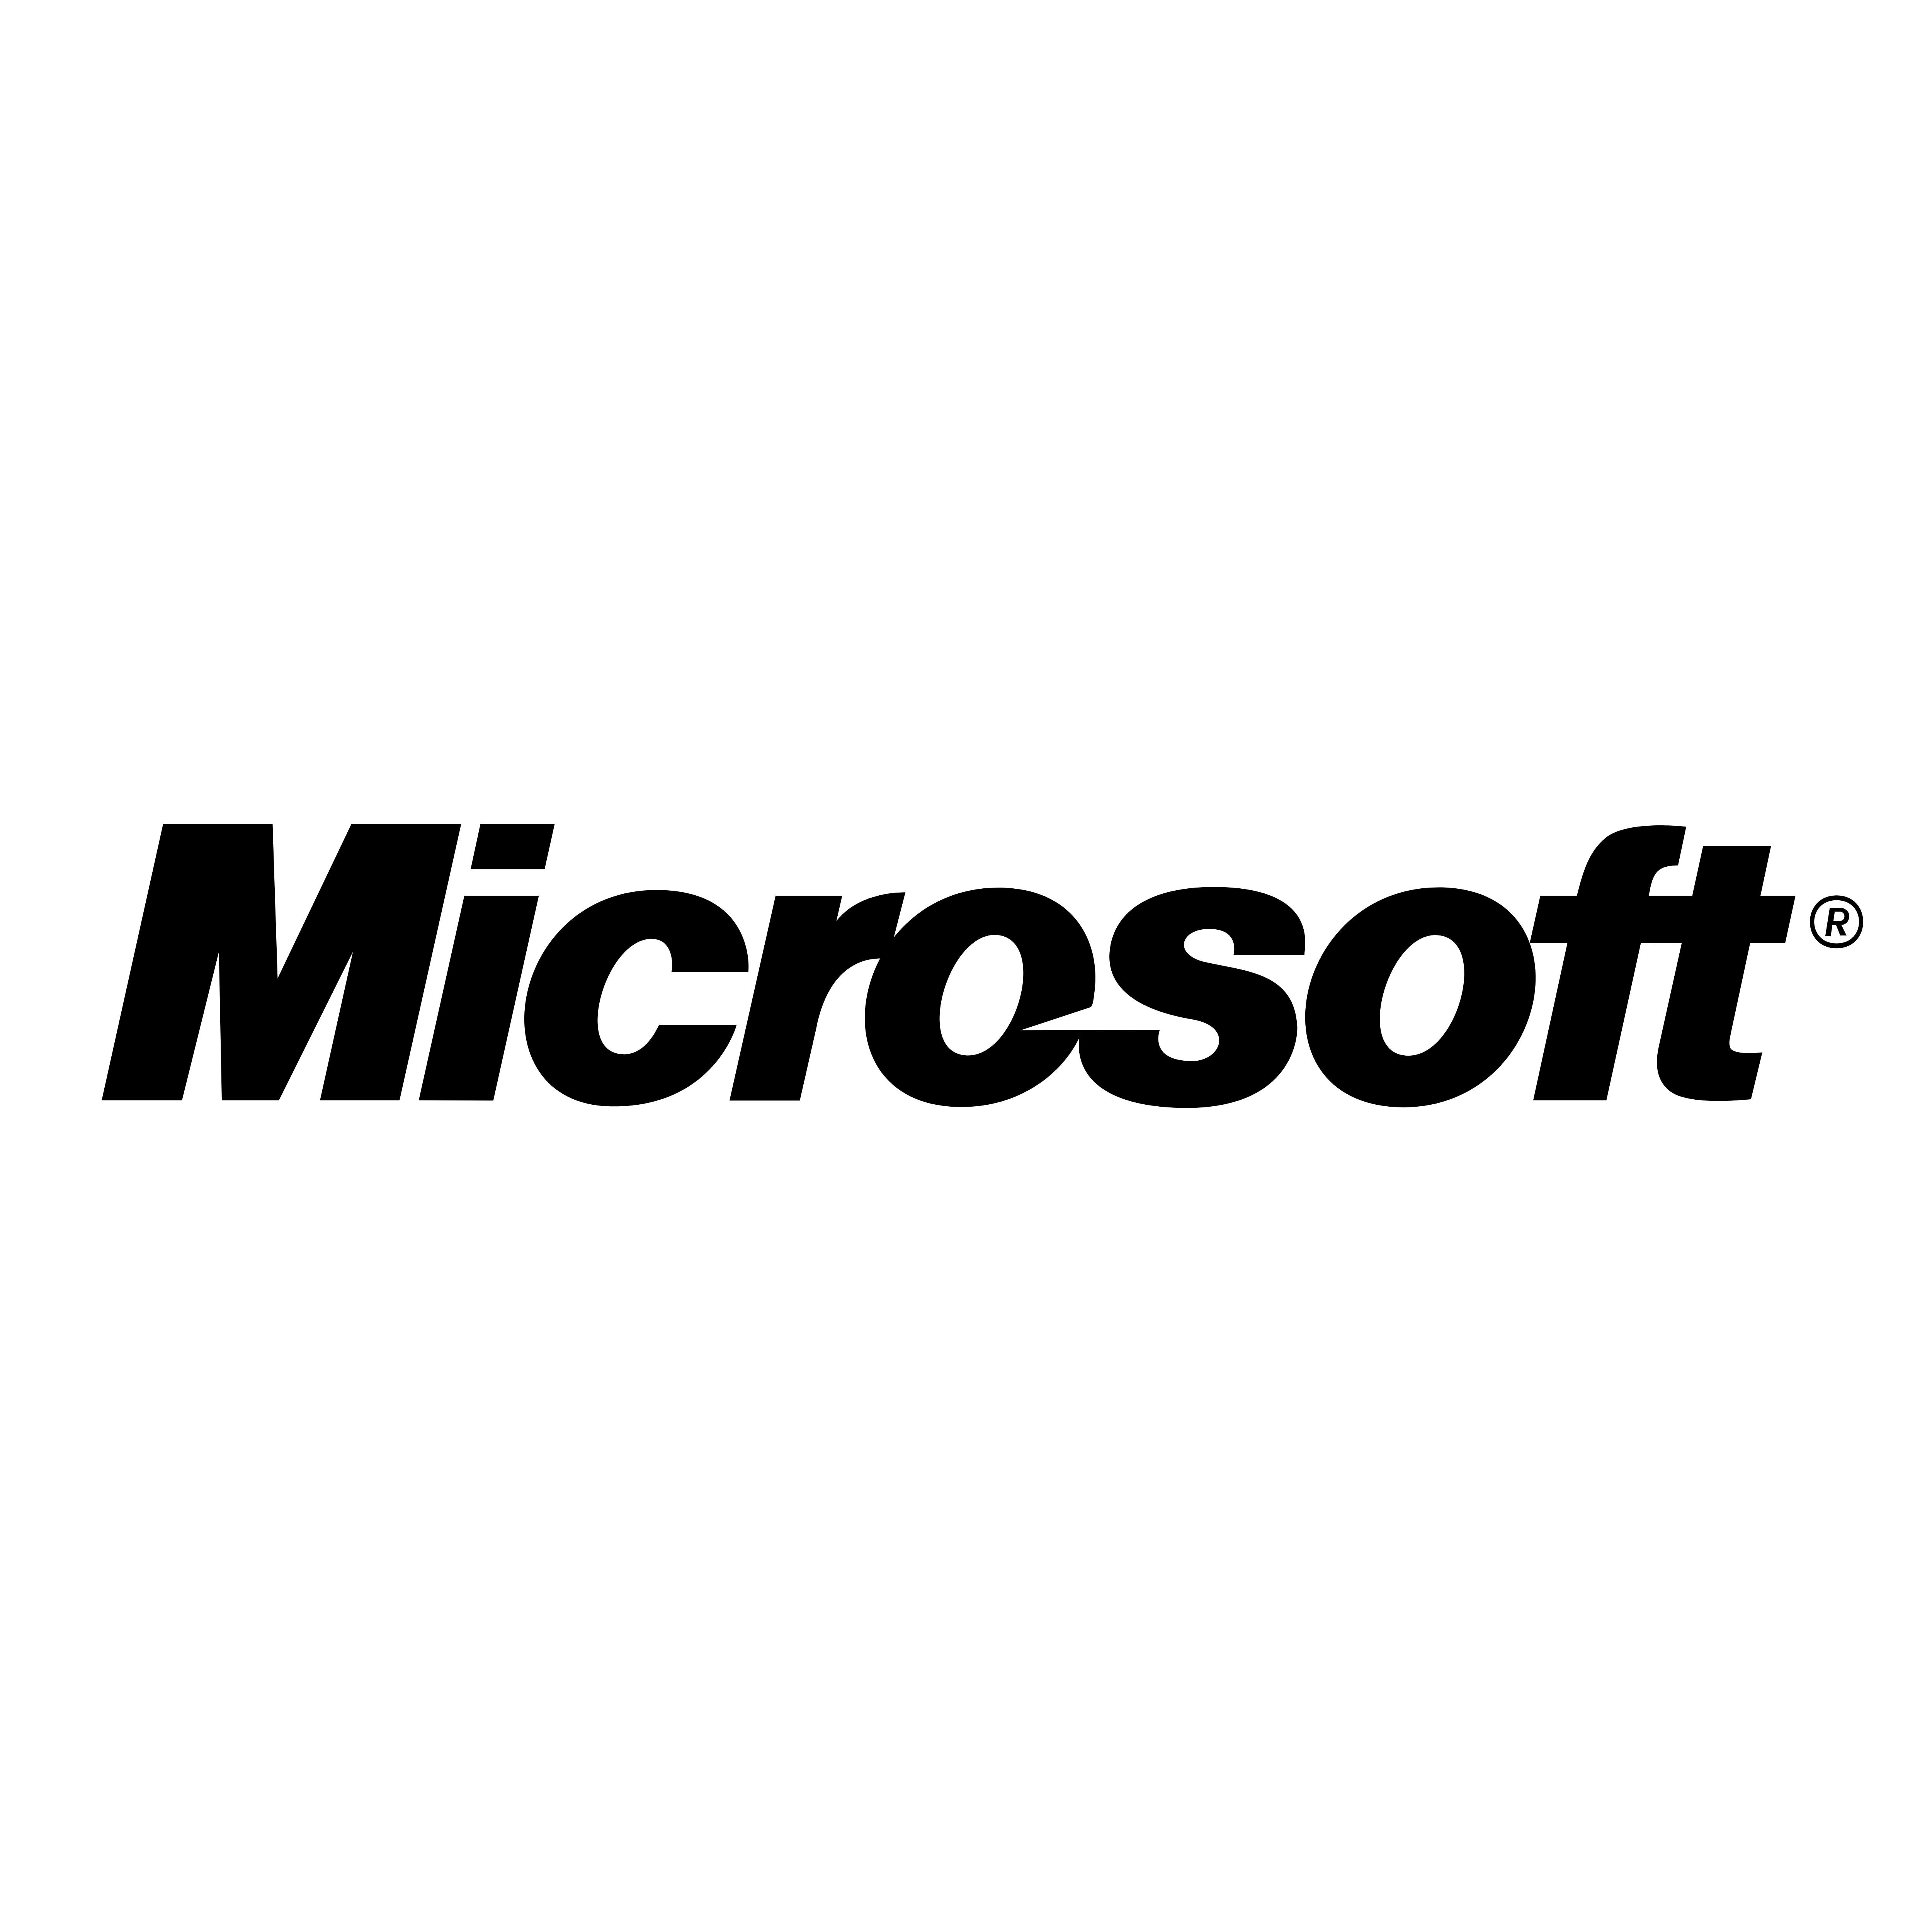 Microsoft – Logos Download - Microsoft Logo PNG